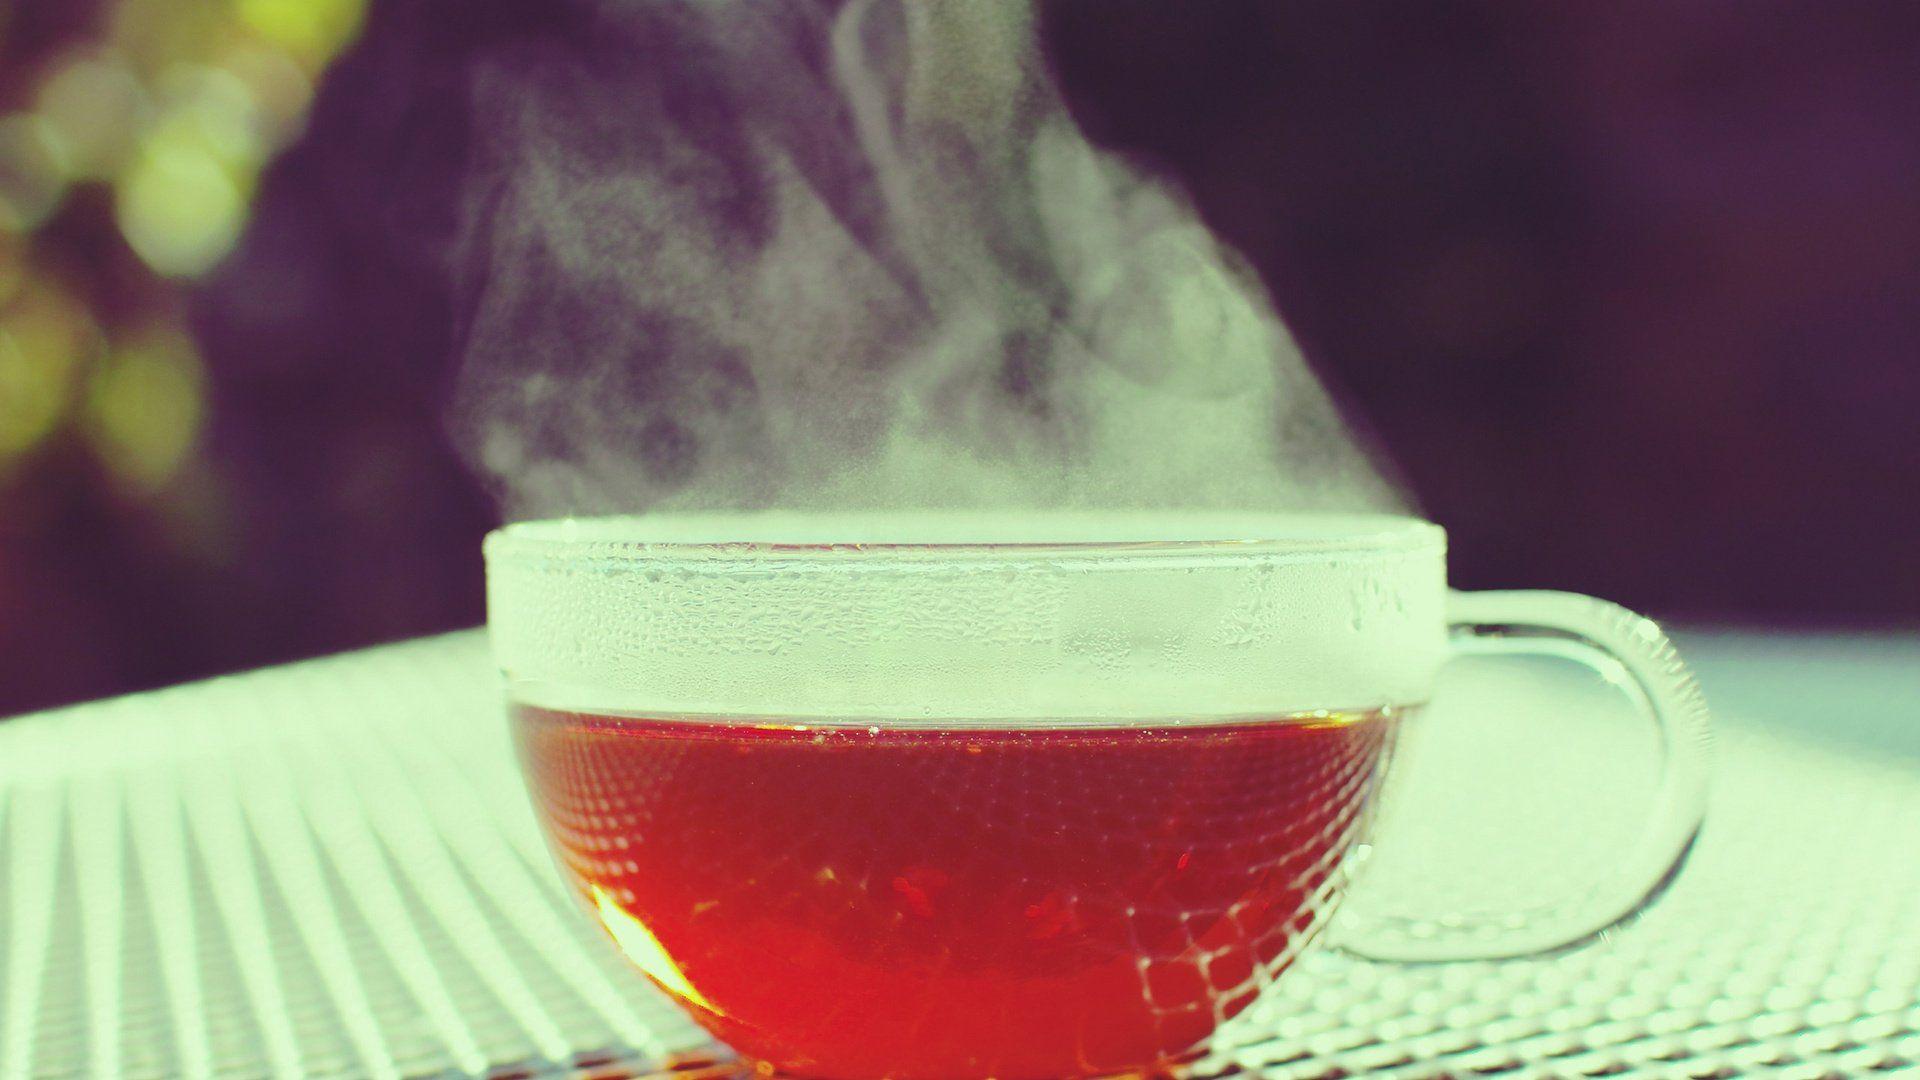 Tea picture wallpaper